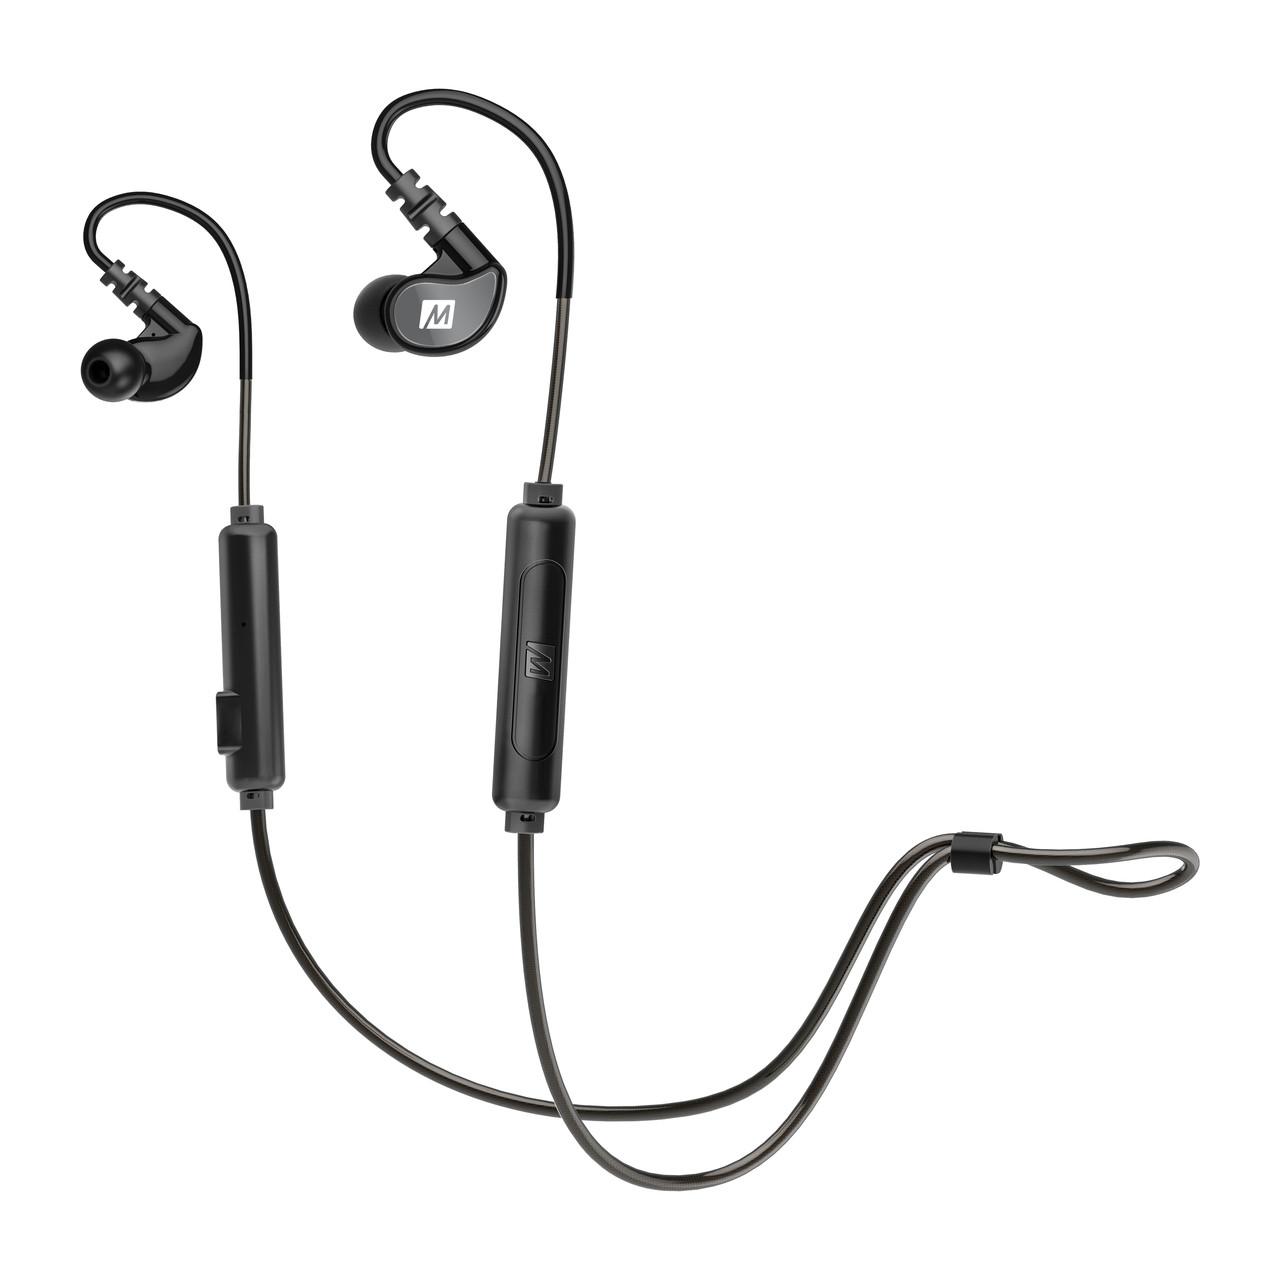 small resolution of m6b wireless earphone 2019 version user manual